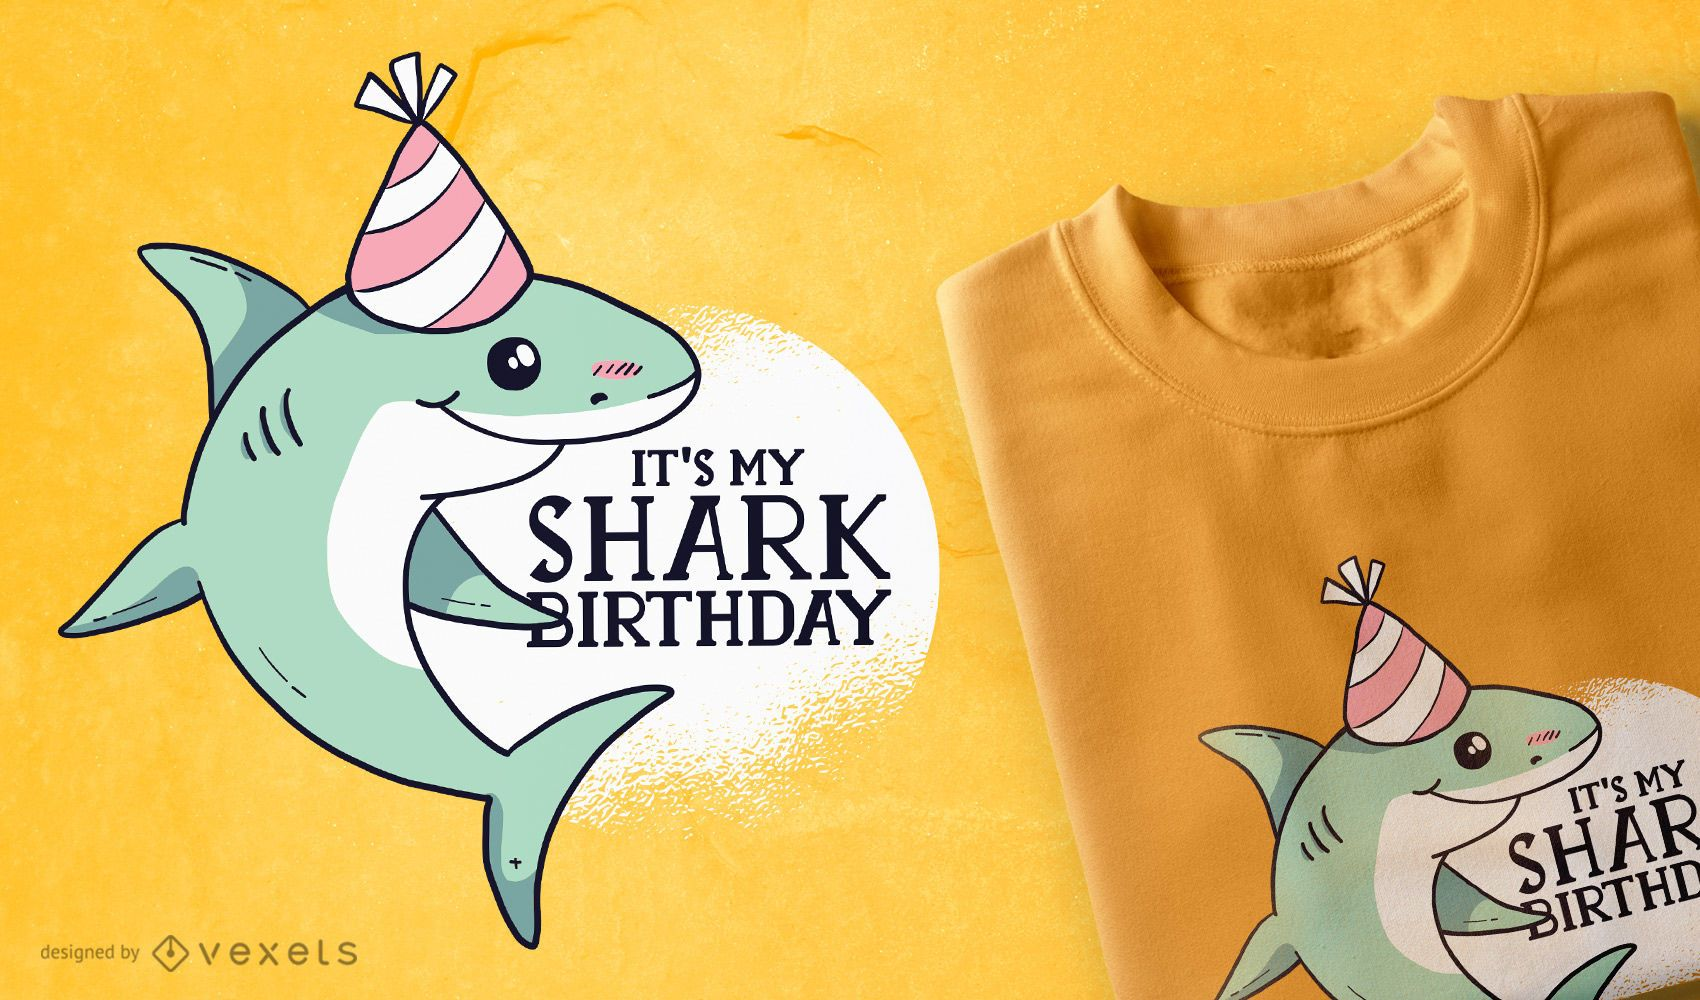 Shark Birthday T-Shirt Design